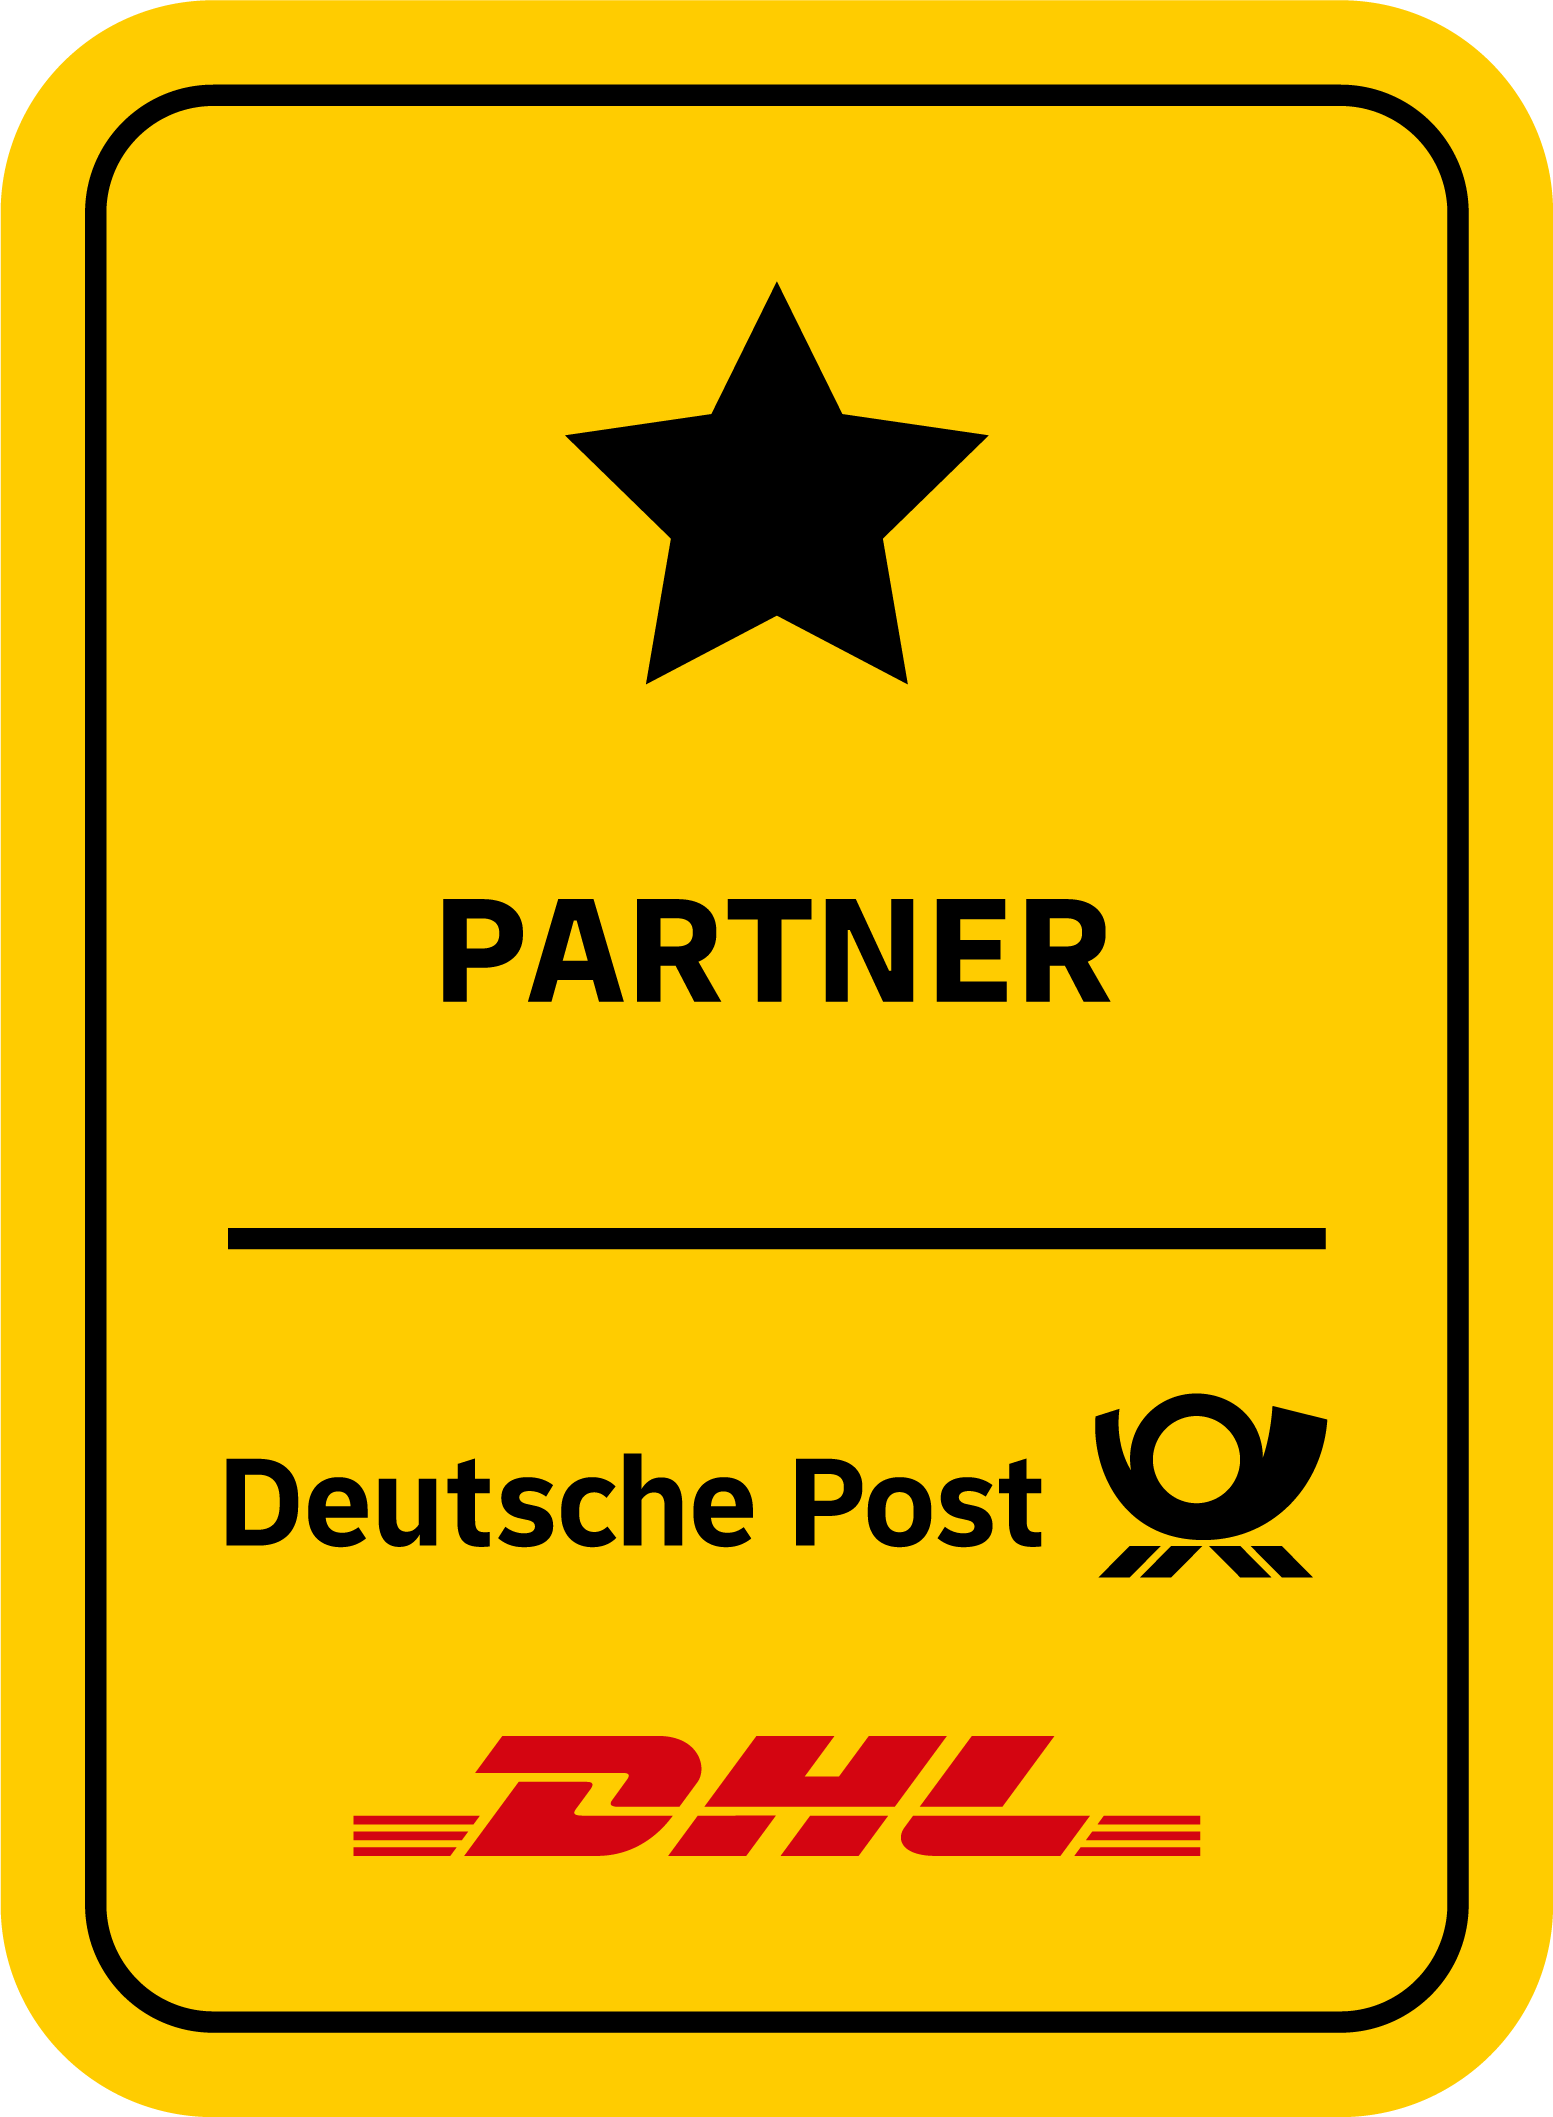 P_und_P_Partnersignet_Partner_rgb